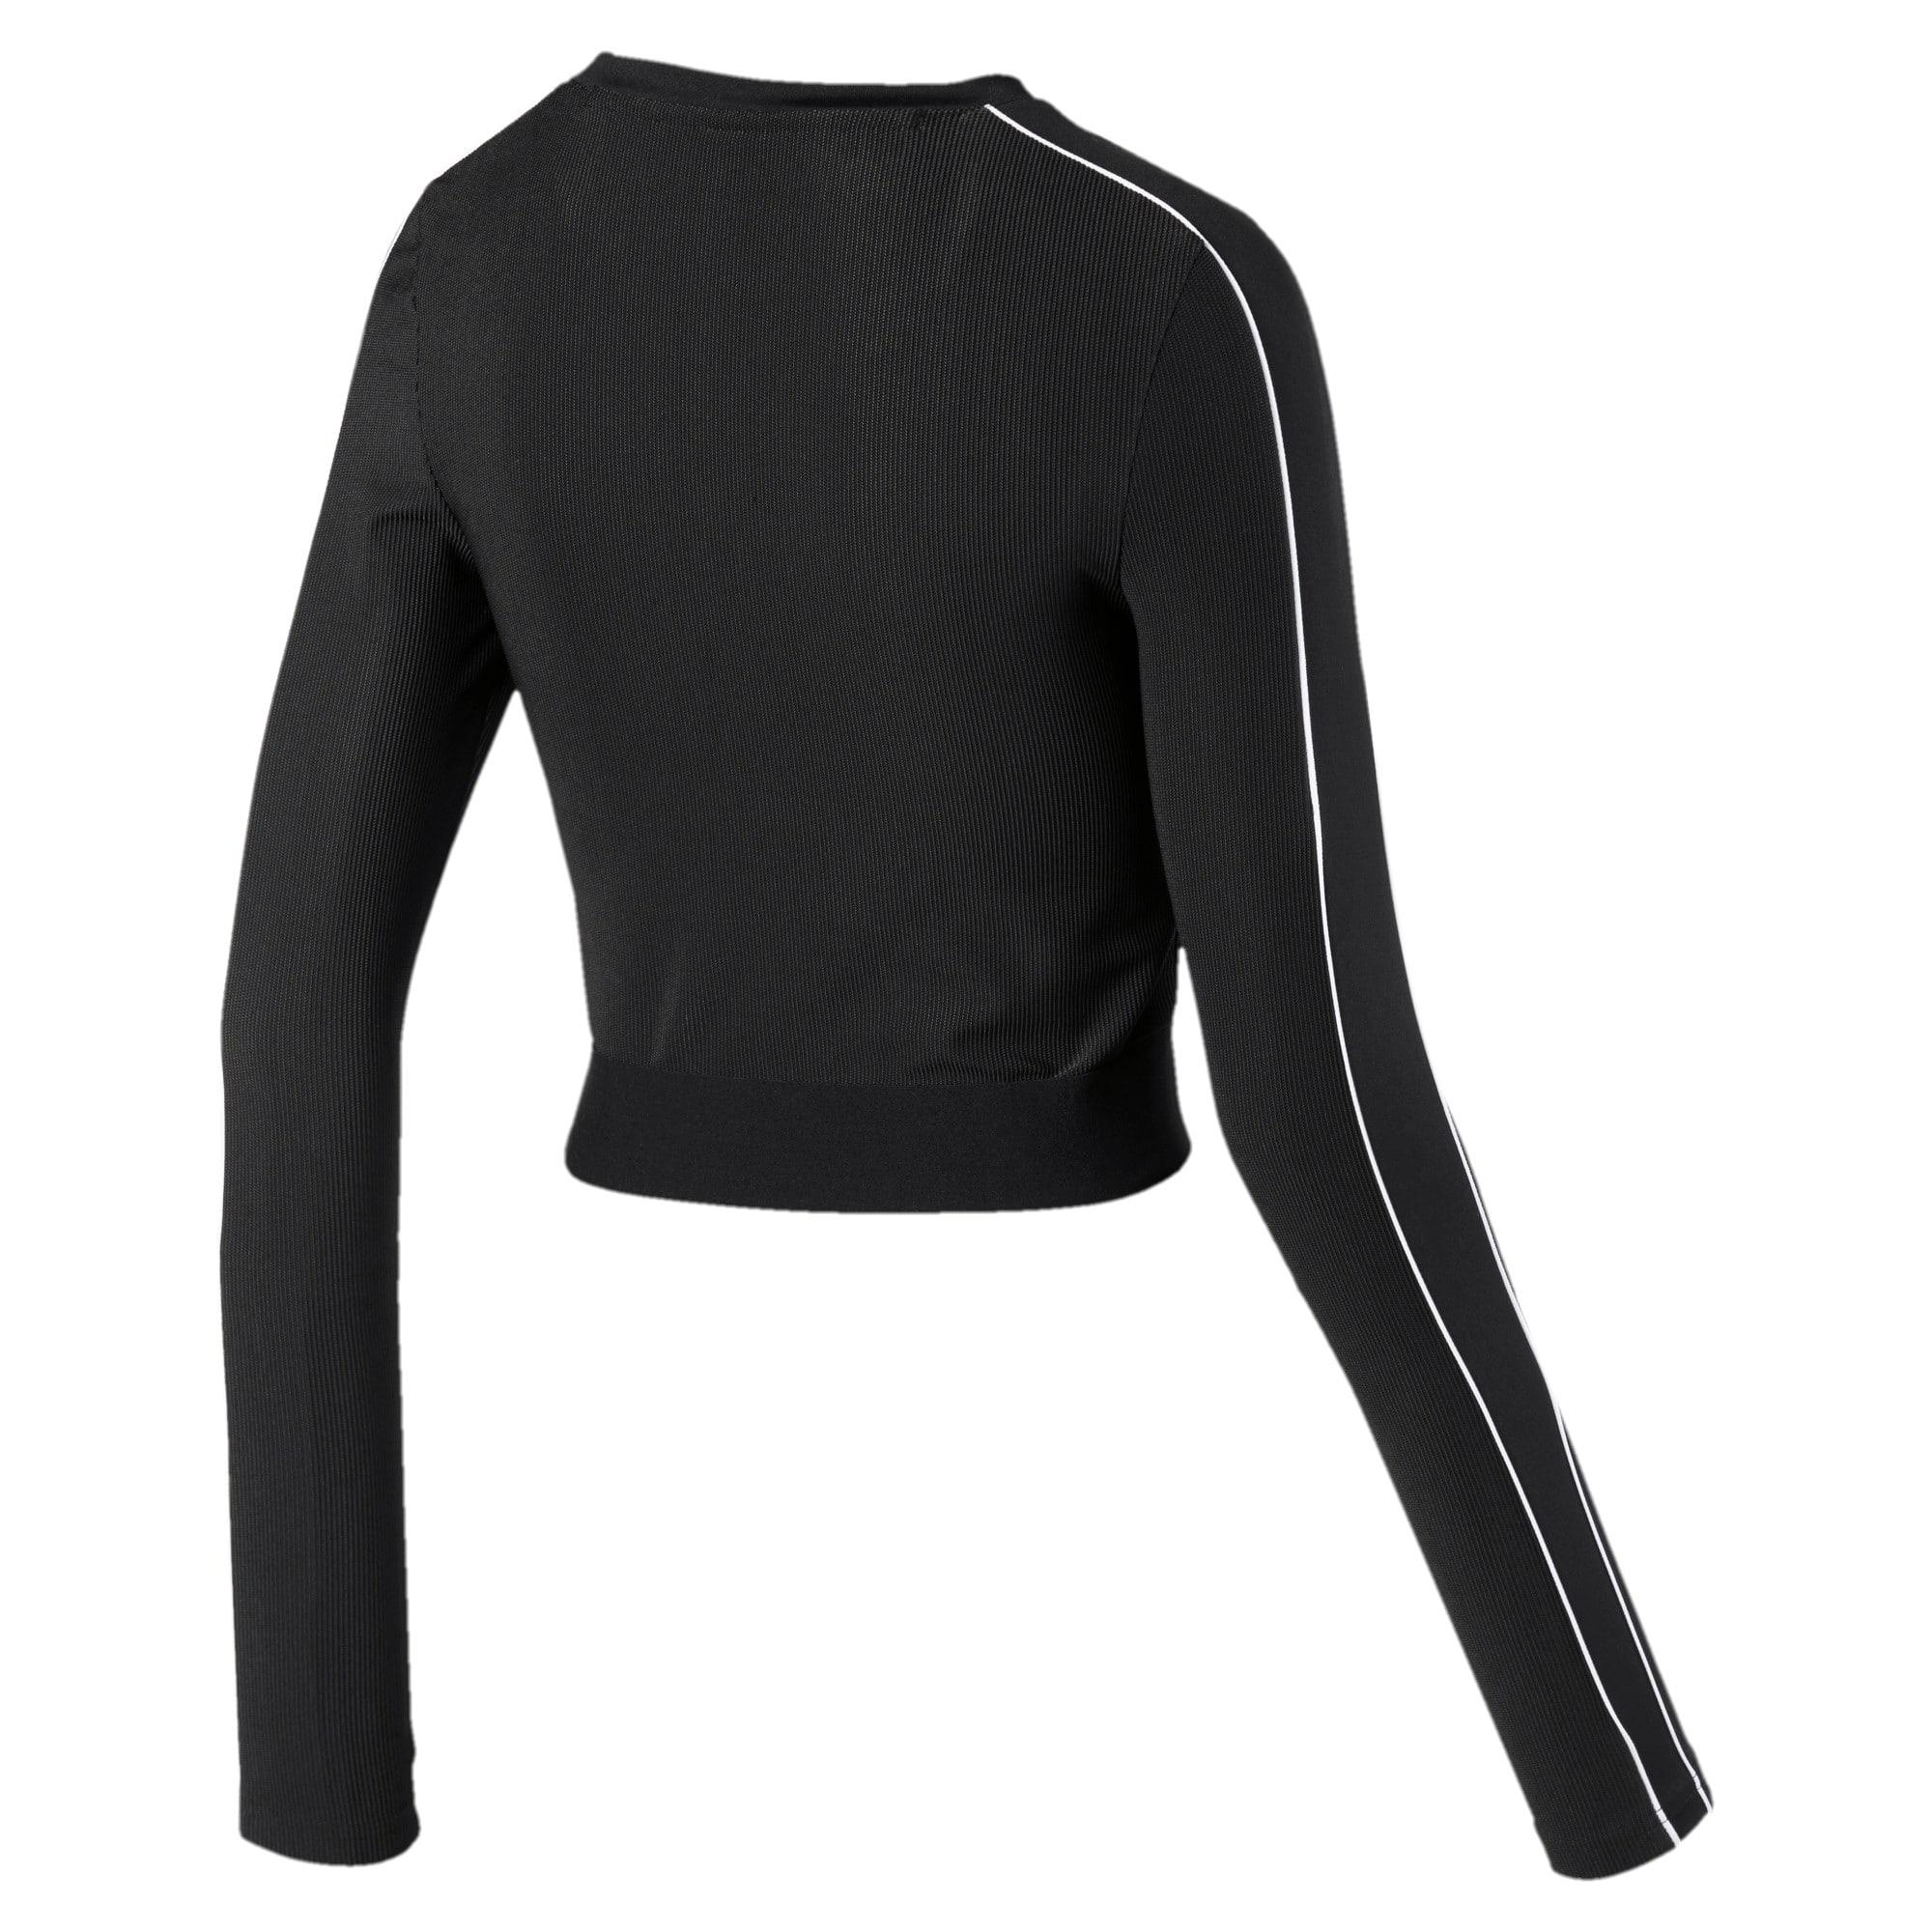 Thumbnail 5 of Classics Rib Cropped Long Sleeve Women's Top, Puma Black, medium